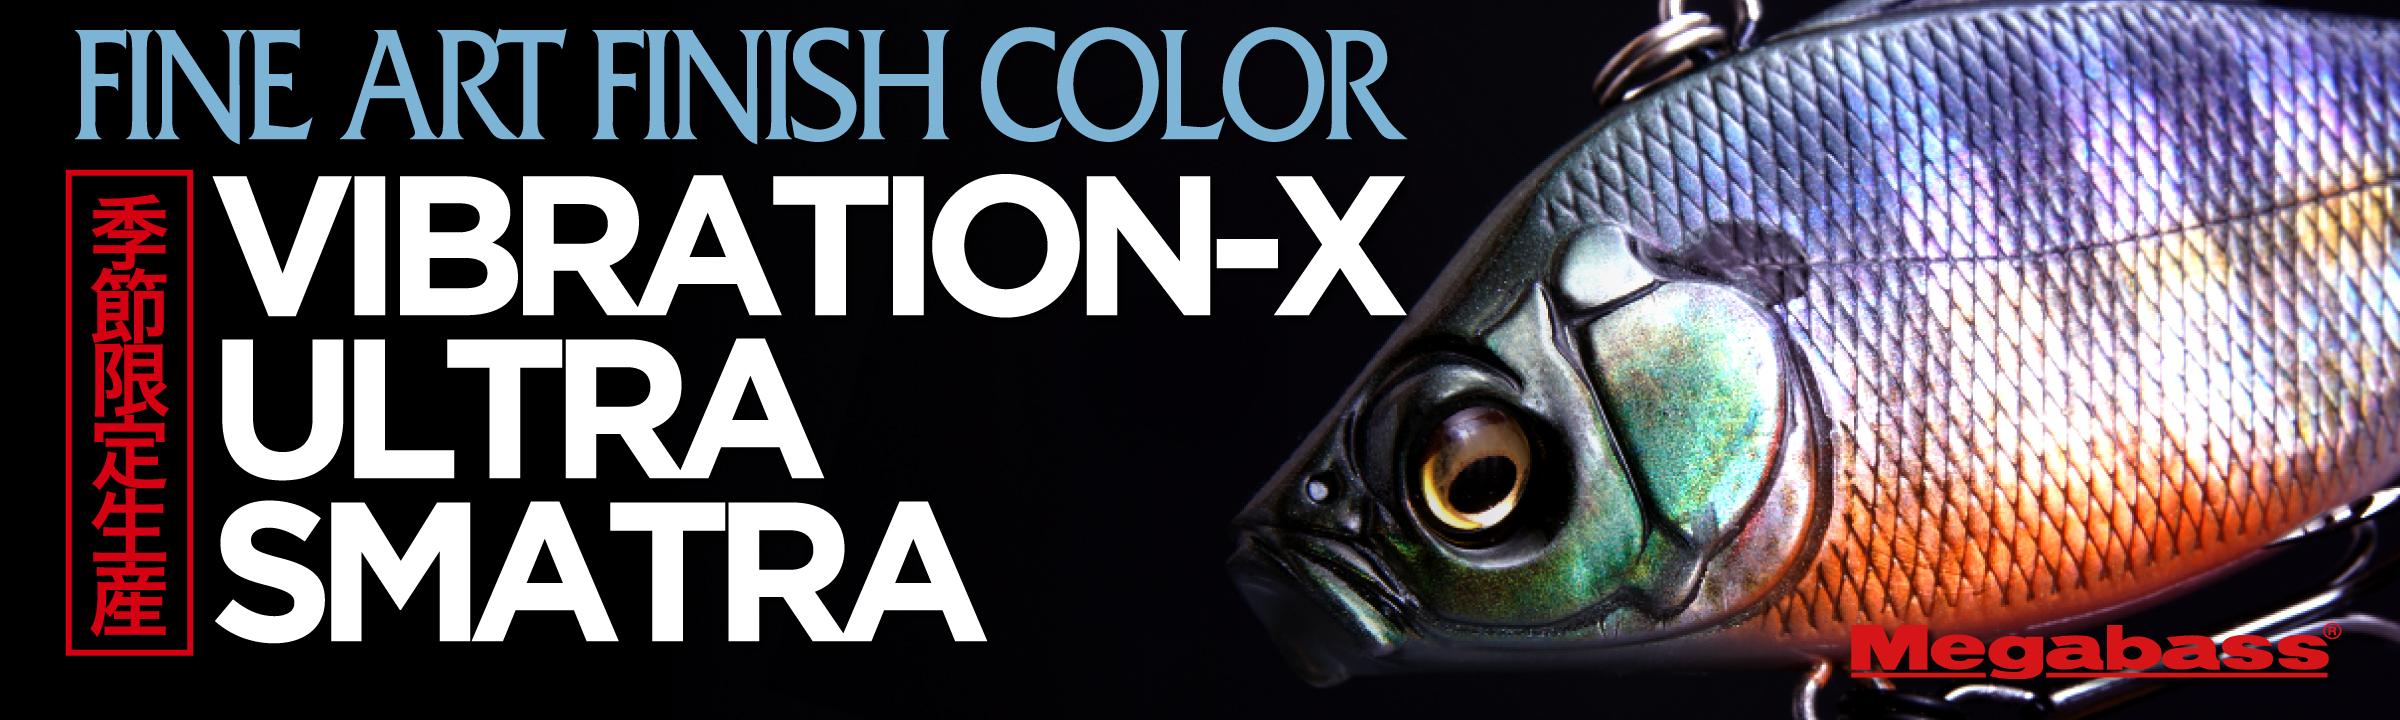 FINE ART FINISH COLOR VIBRATION-X ULTRA SMATRA 季節限定生産